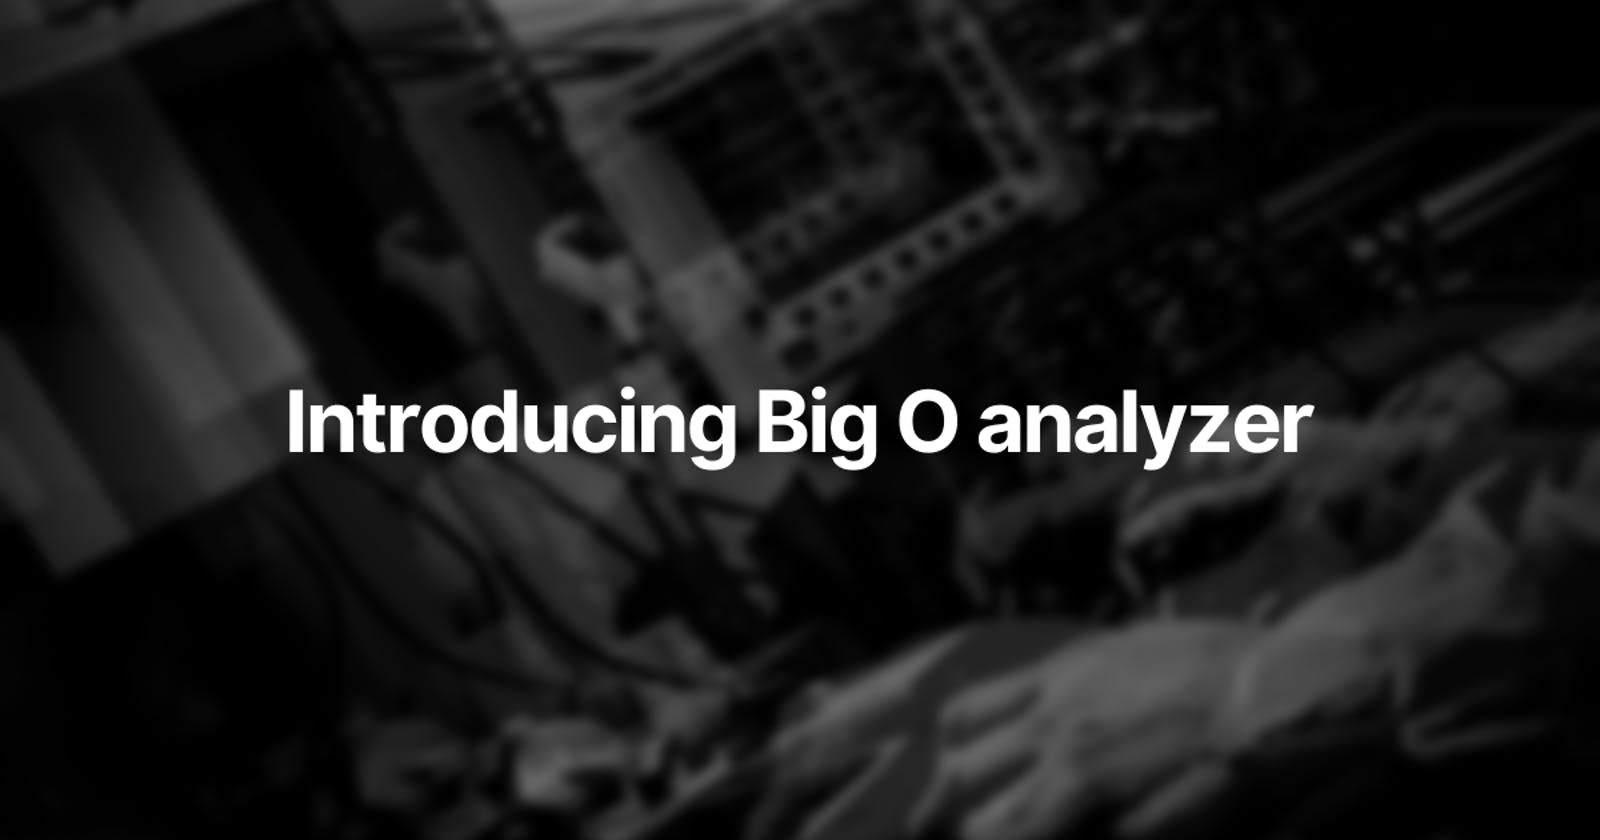 Introducing an efficient Big O analyzer